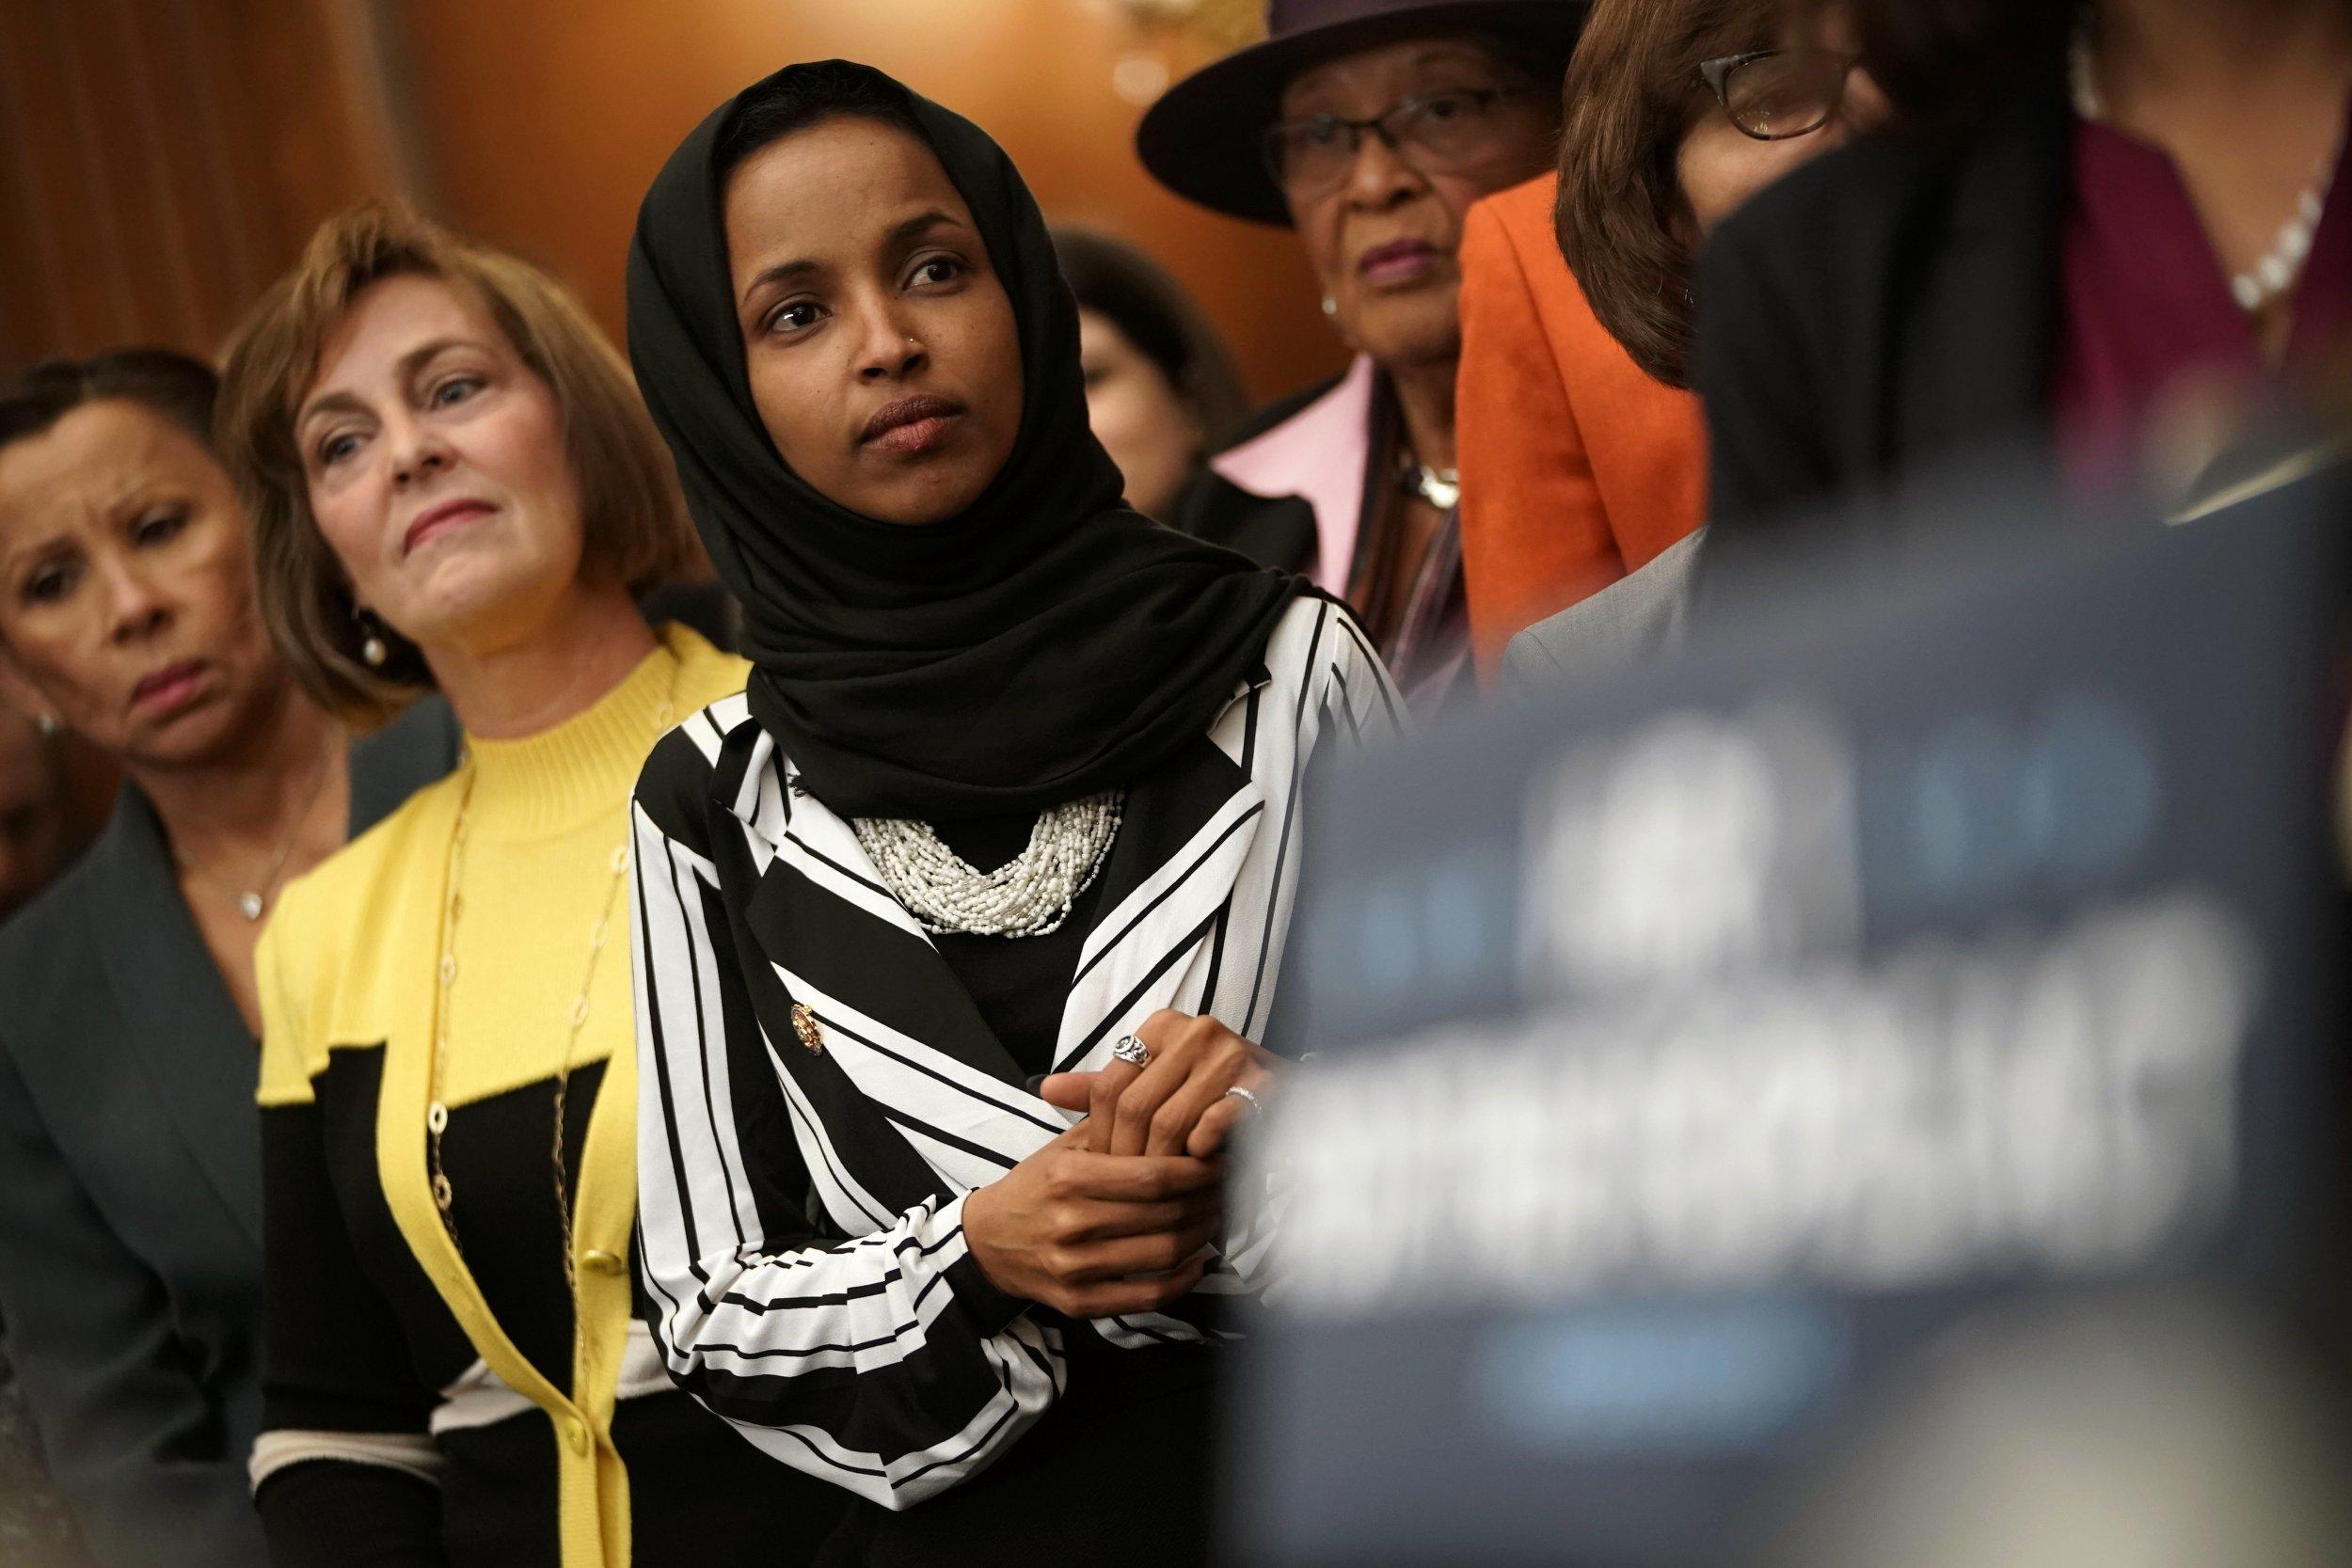 democrats, muslim, freshmen, anti-semitism, republicans, israel